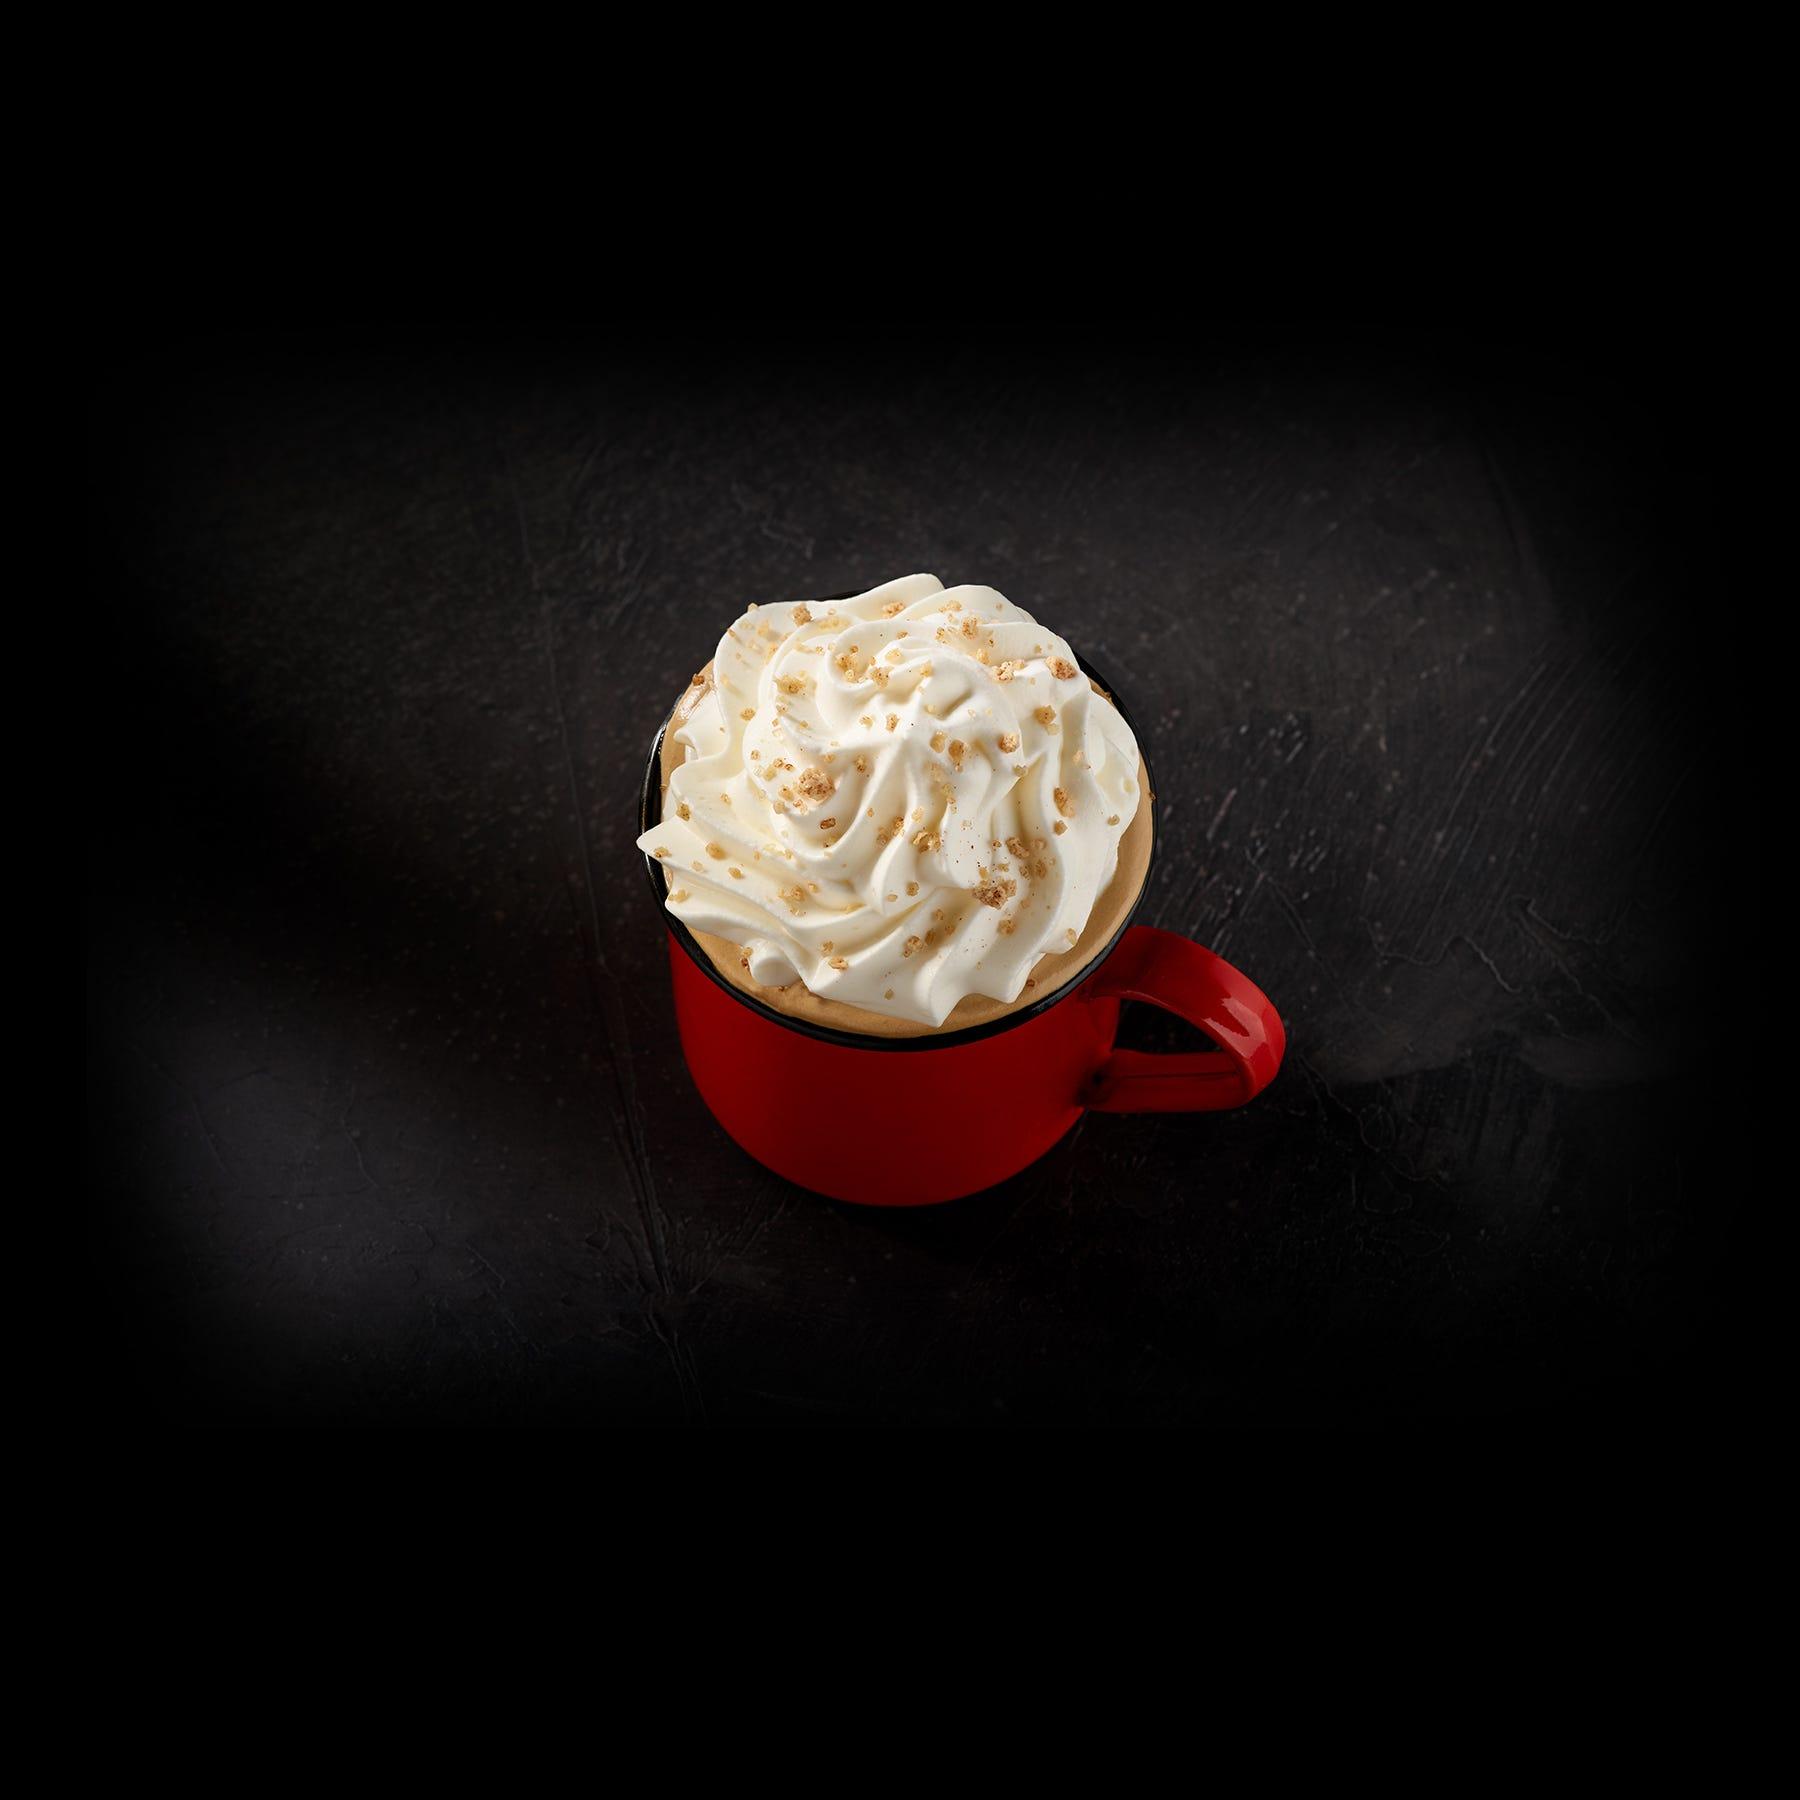 Starbucks Christmas Drinks 2018.Starbucks Holiday Menu 2018 New Seasonal Food Drinks